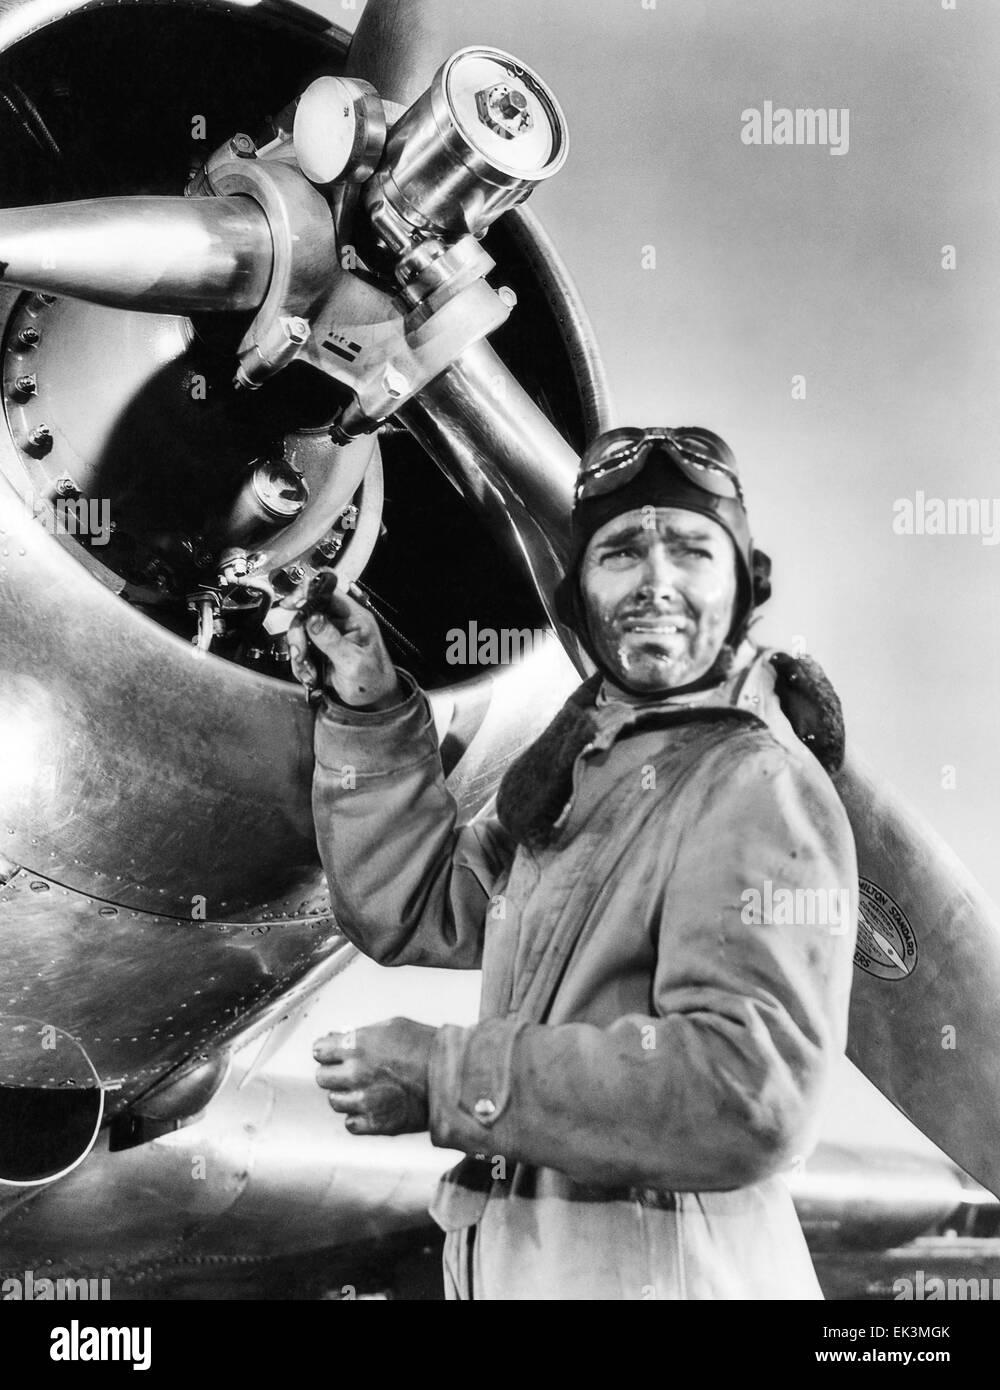 Clark Gable, on-set of the Film 'Test Pilot', 1938 - Stock Image